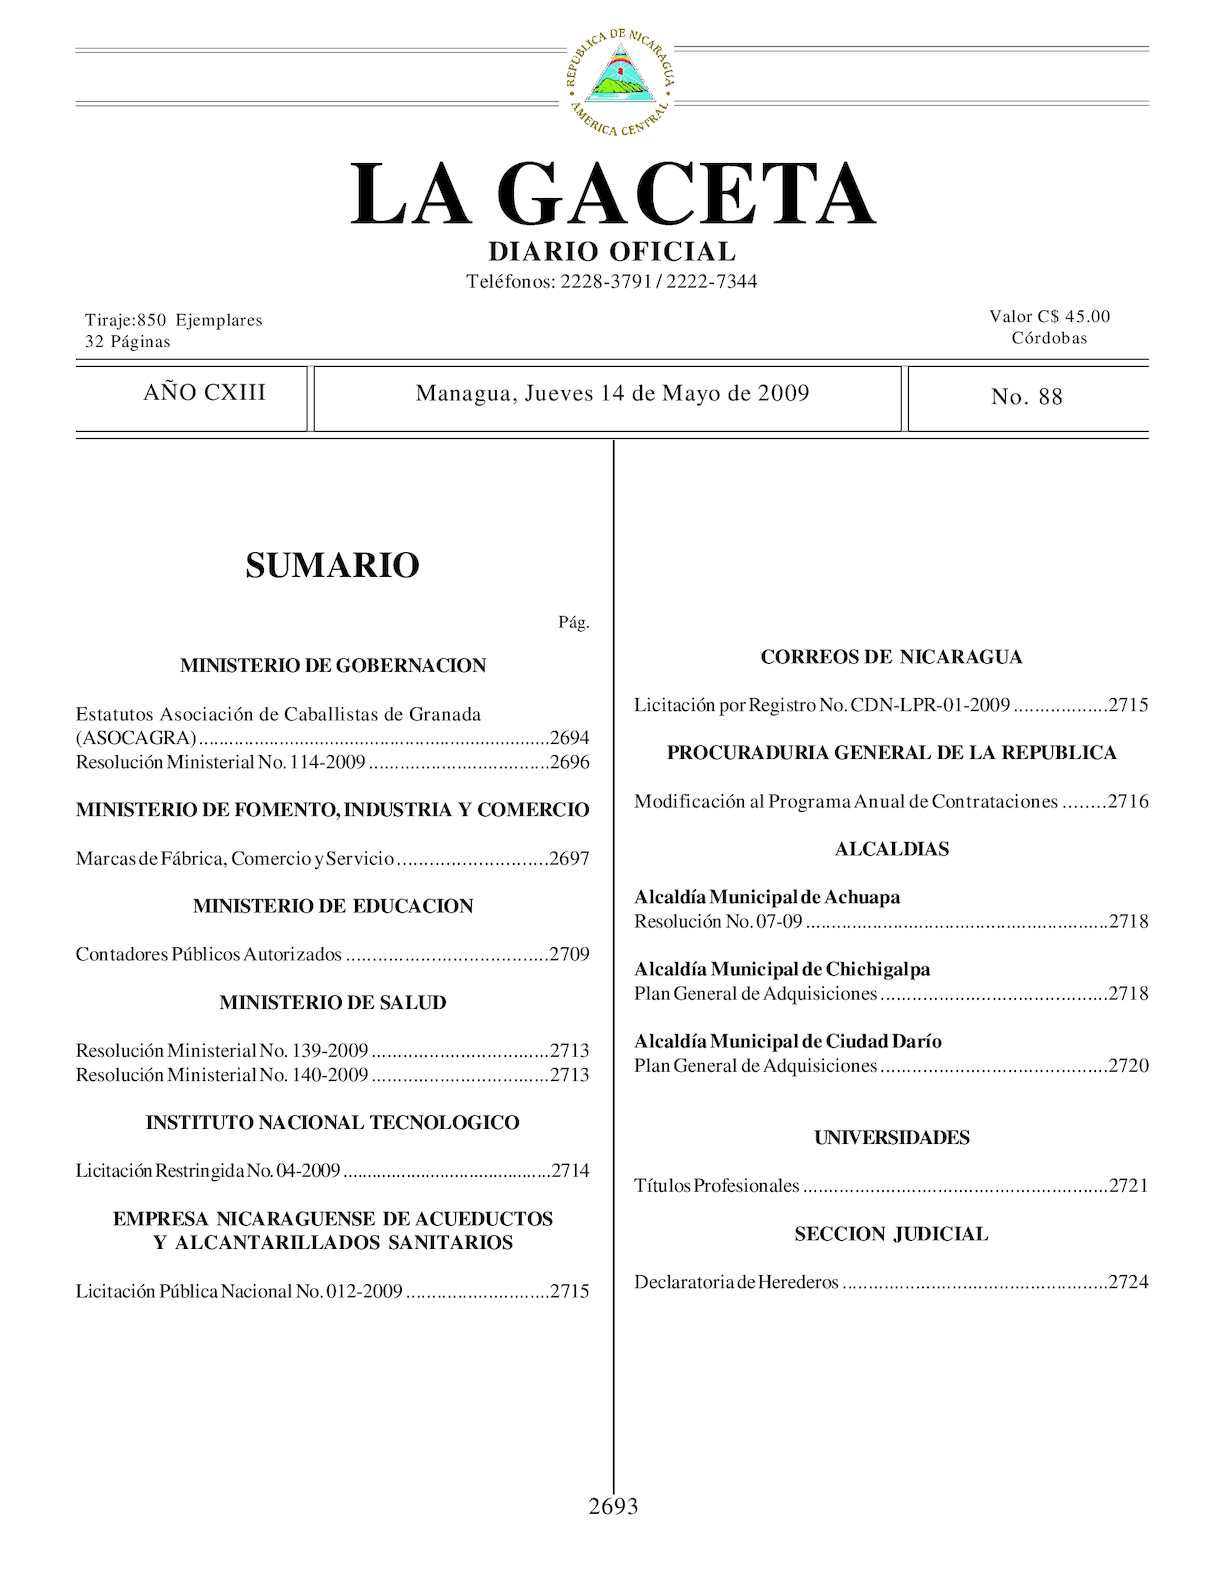 Calaméo Gaceta 88 Jueves 14 De Mayo 2009